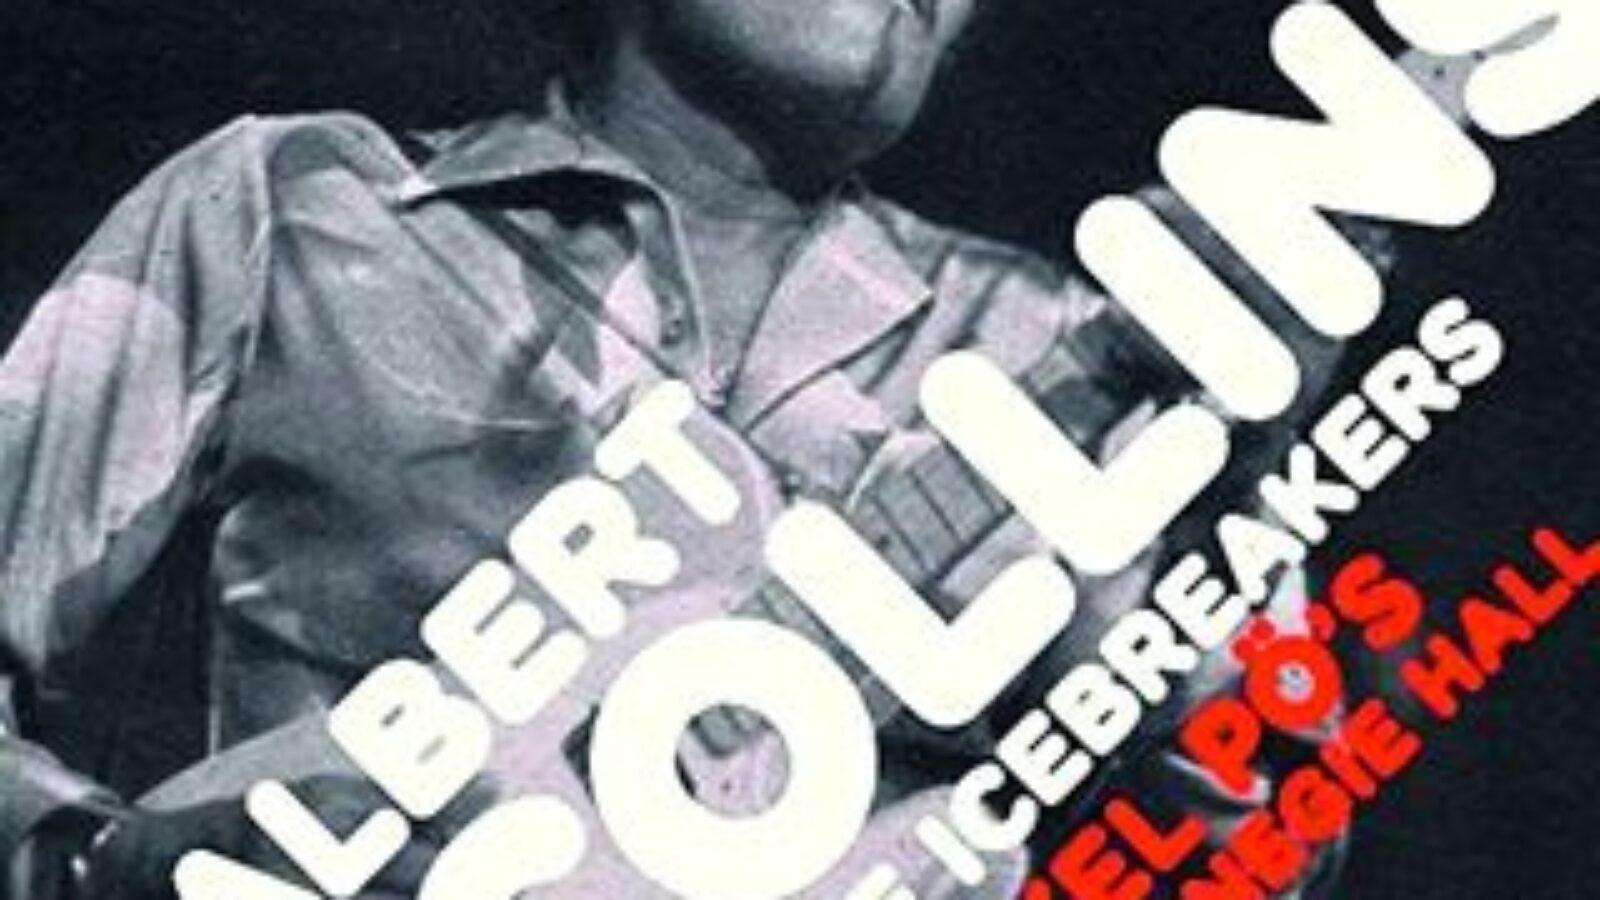 OXMOX CD-Tipp: ALBERT COLLINS – At Onkel Pö's Carnegie Hall